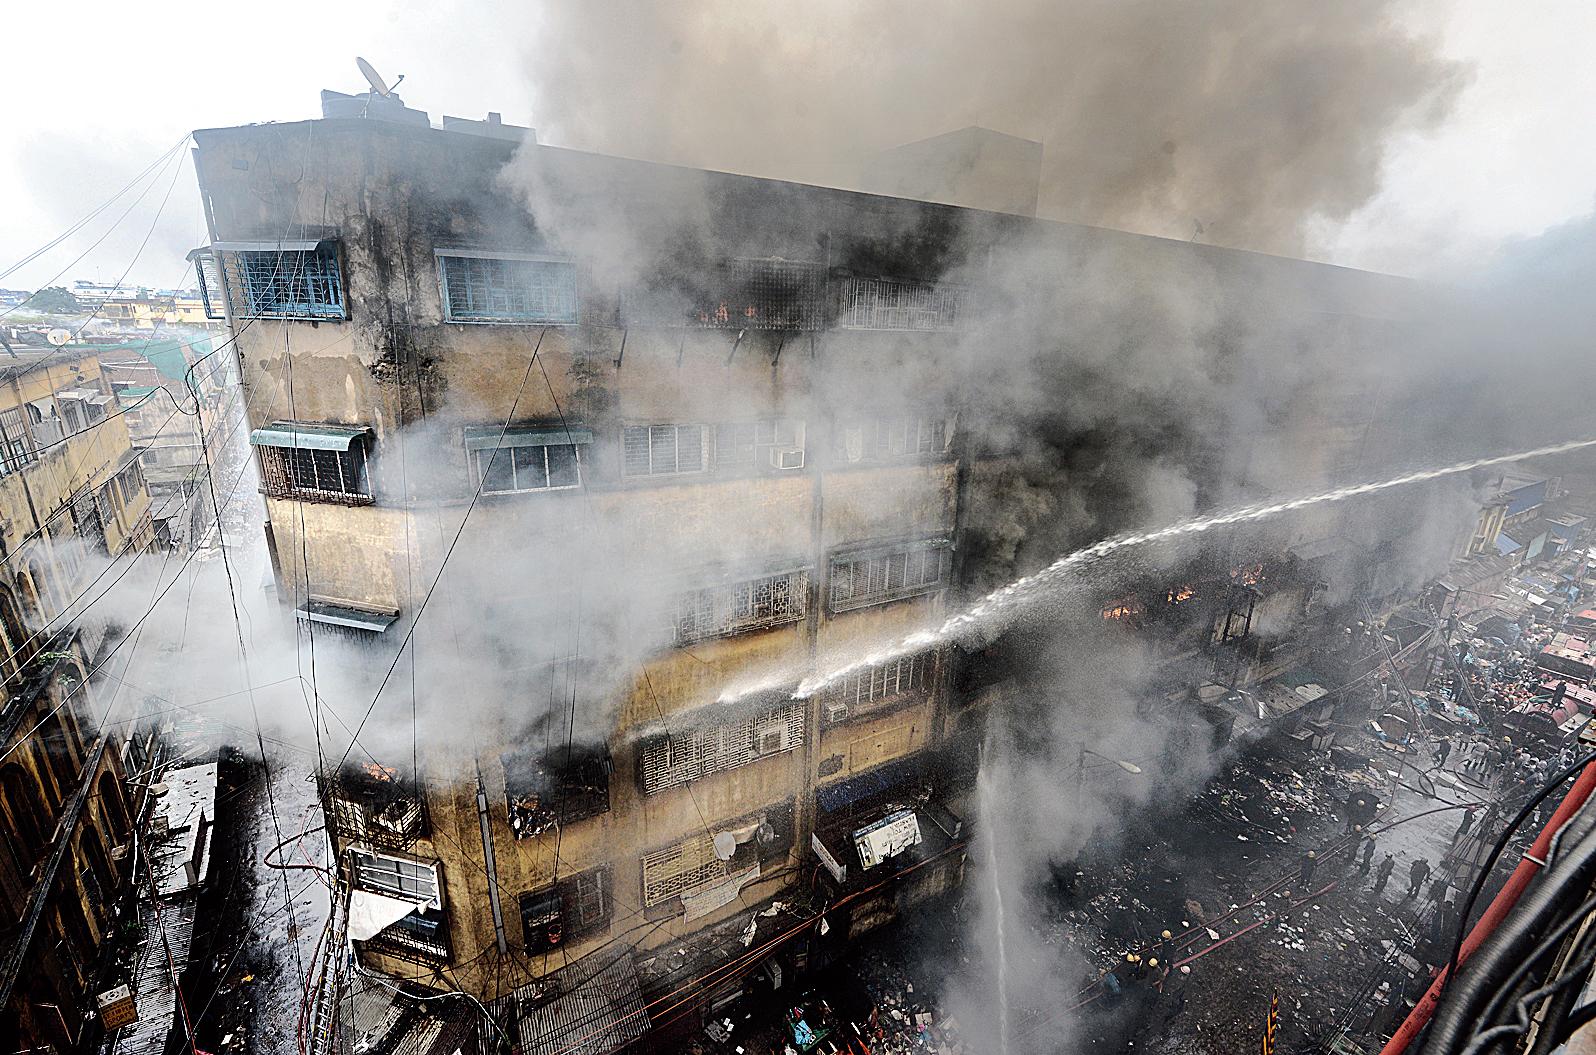 The Bagree Market fire in September 2018